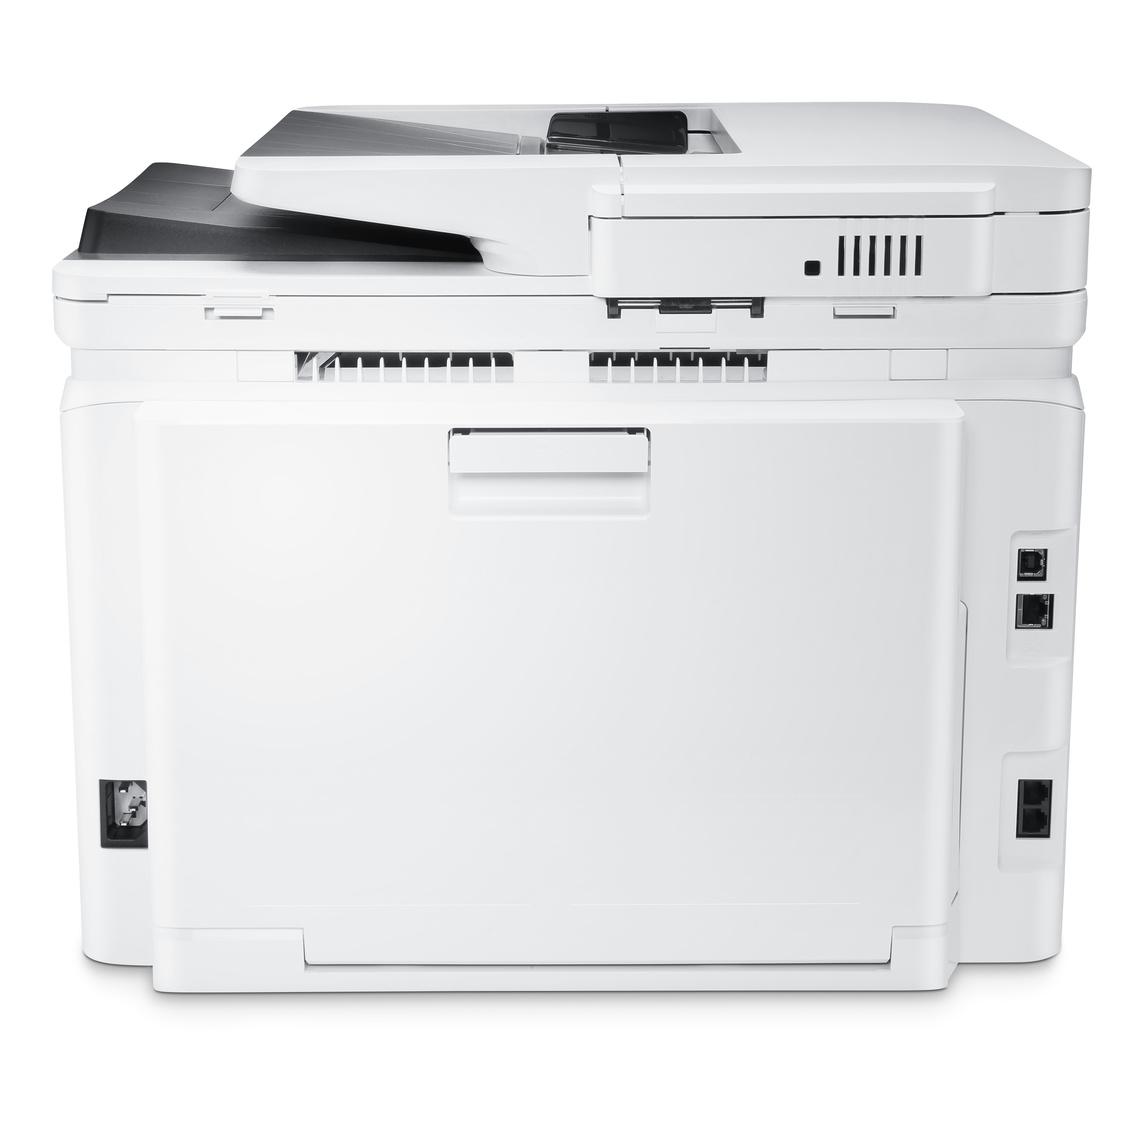 HP LaserJet Pro M281fdw All-in-One Wireless Color Printer